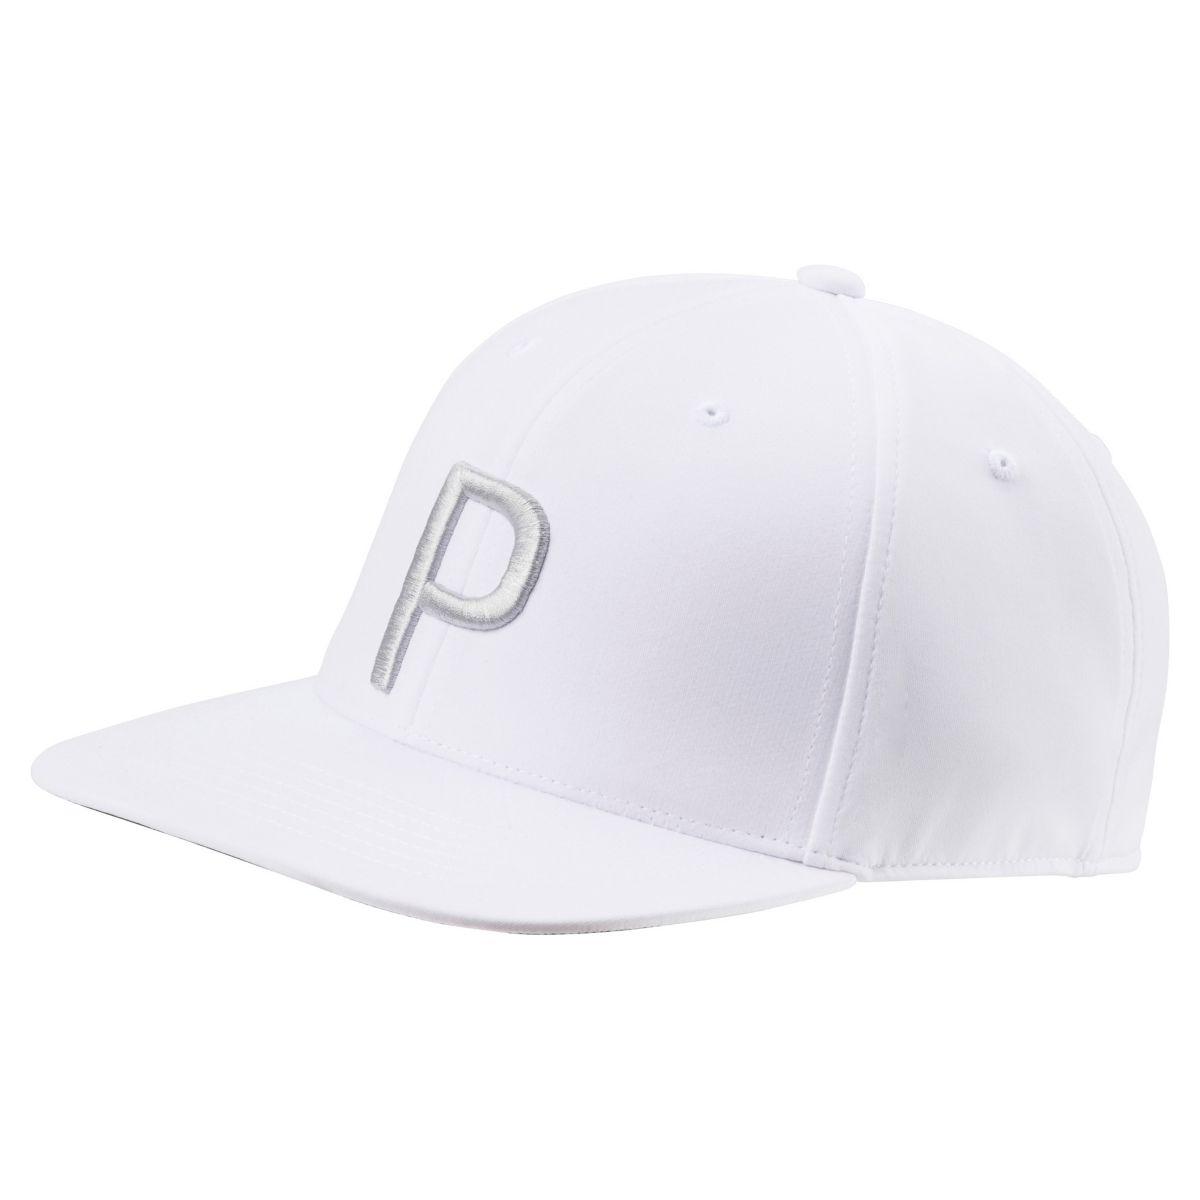 Puma Mens 110 Snapback Cap White